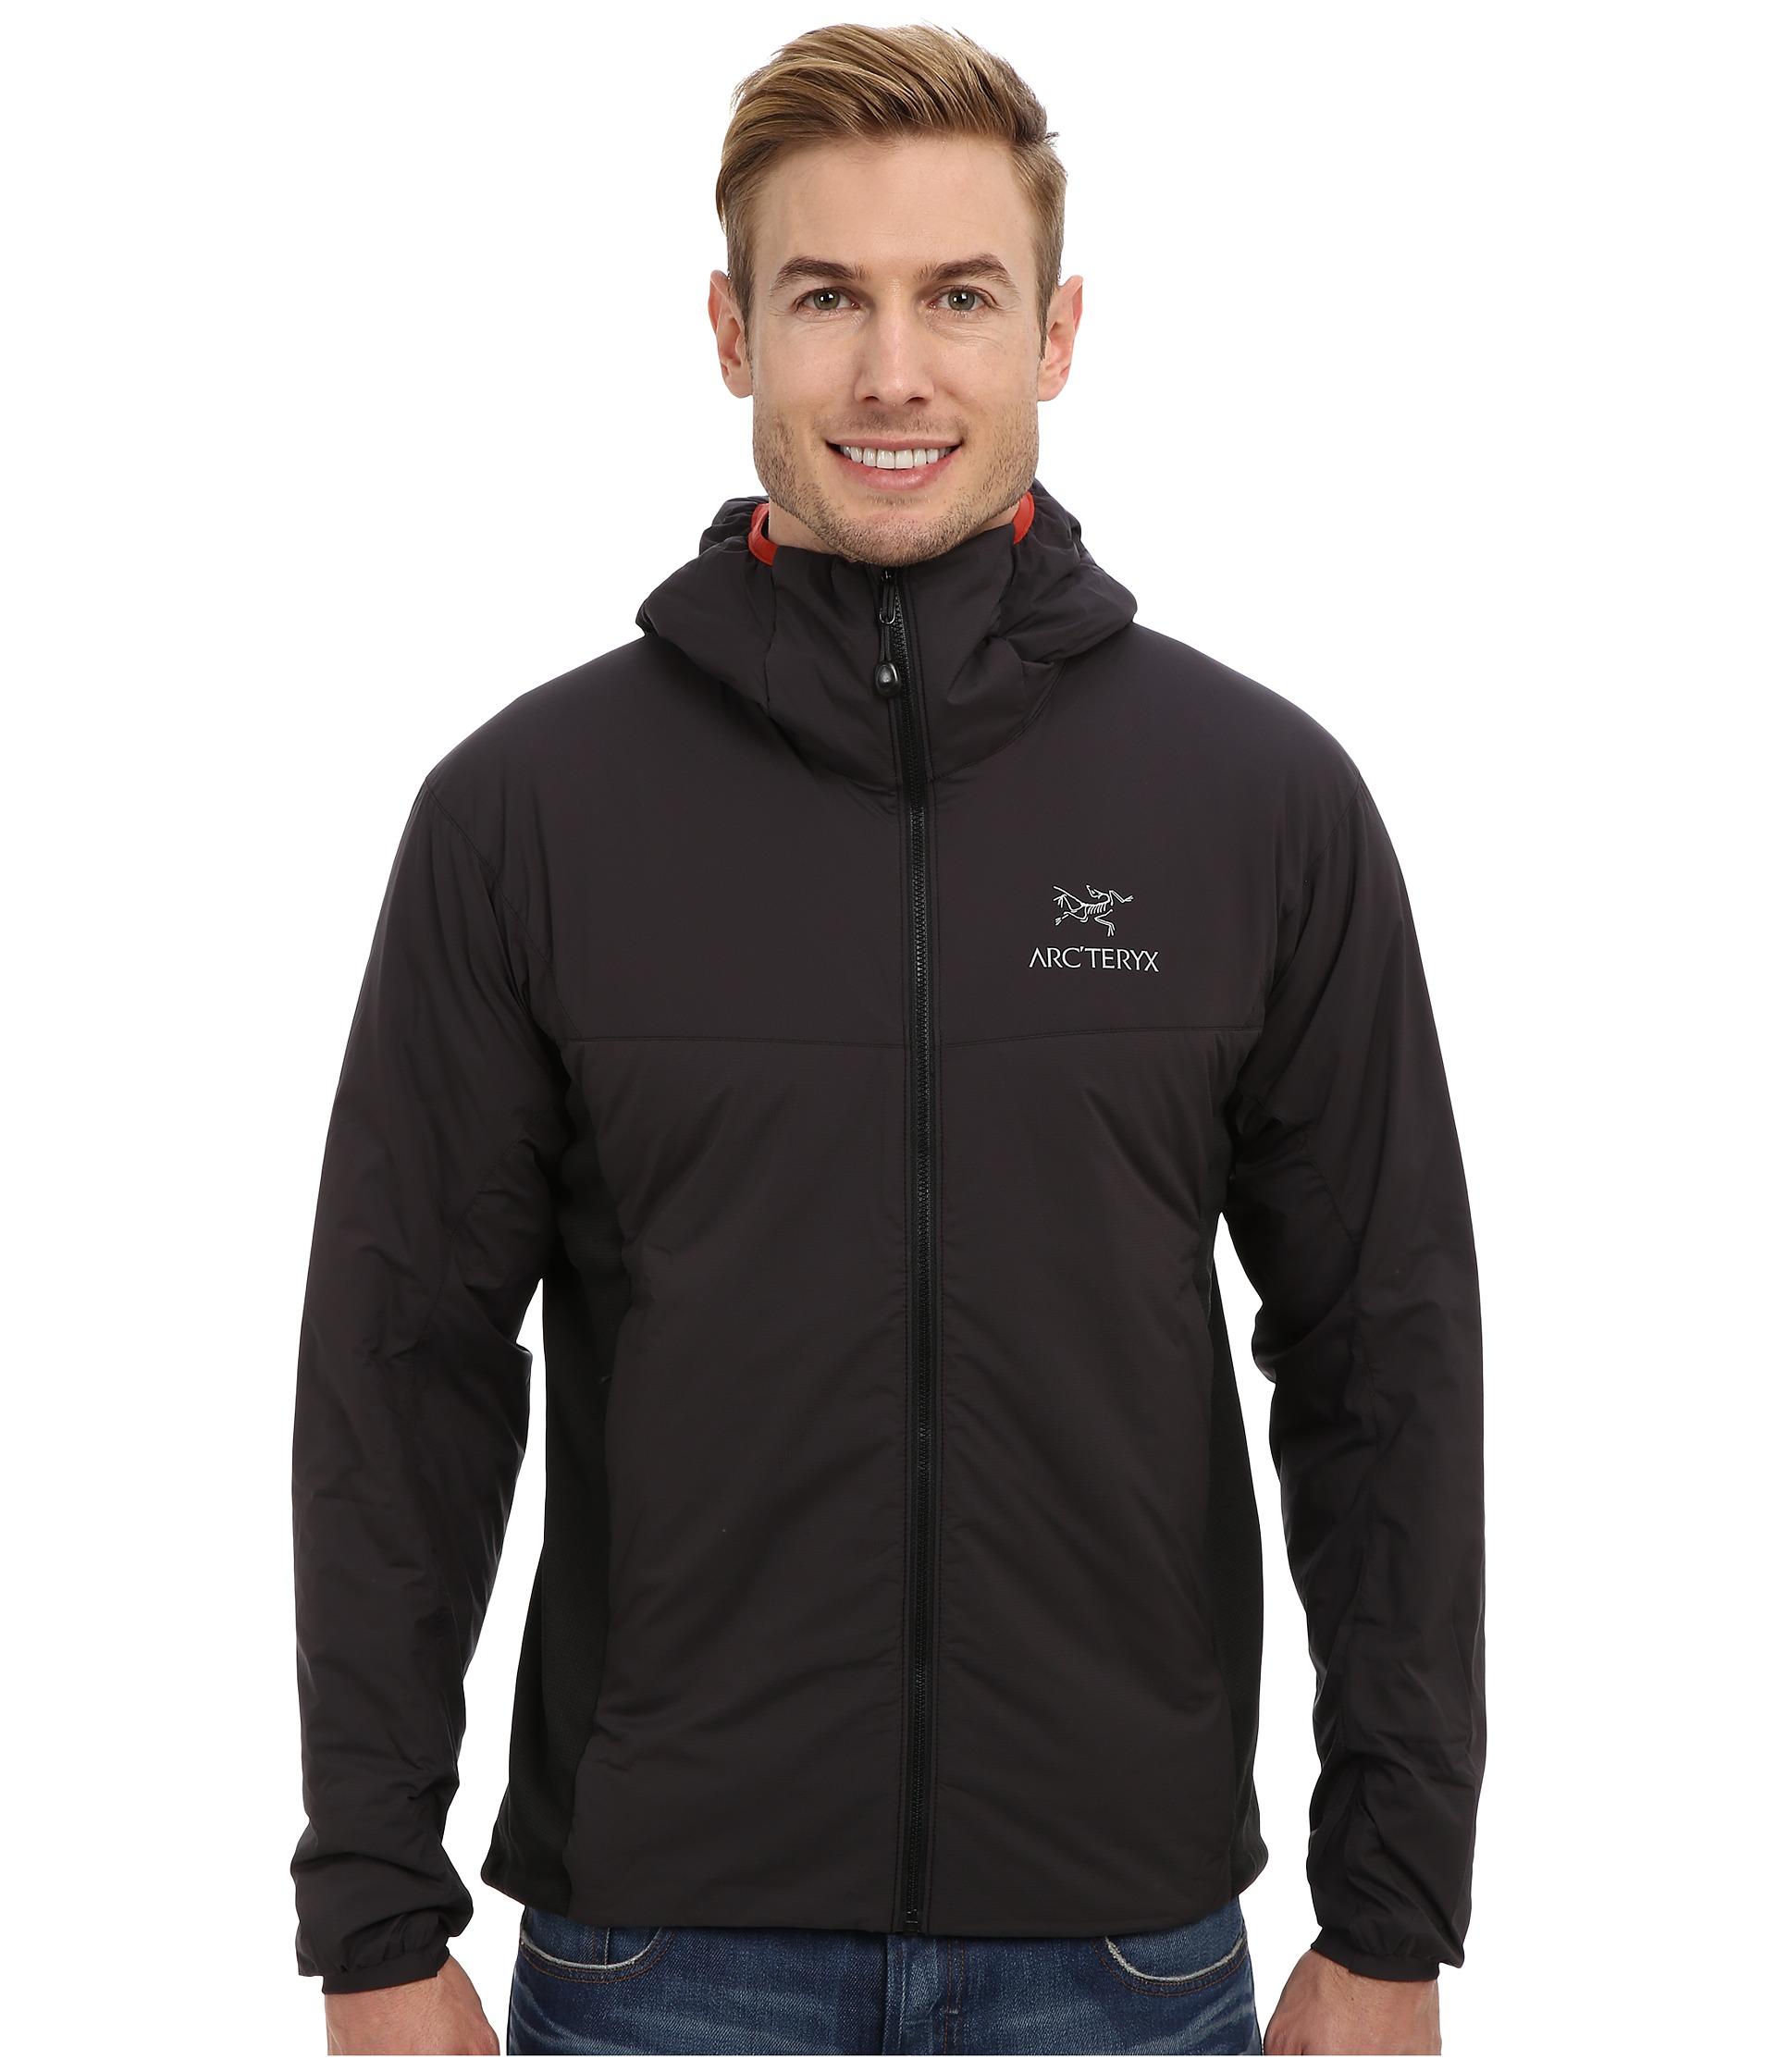 a9bca2c4bc0 Online clothing stores. Arcteryx lt hoody